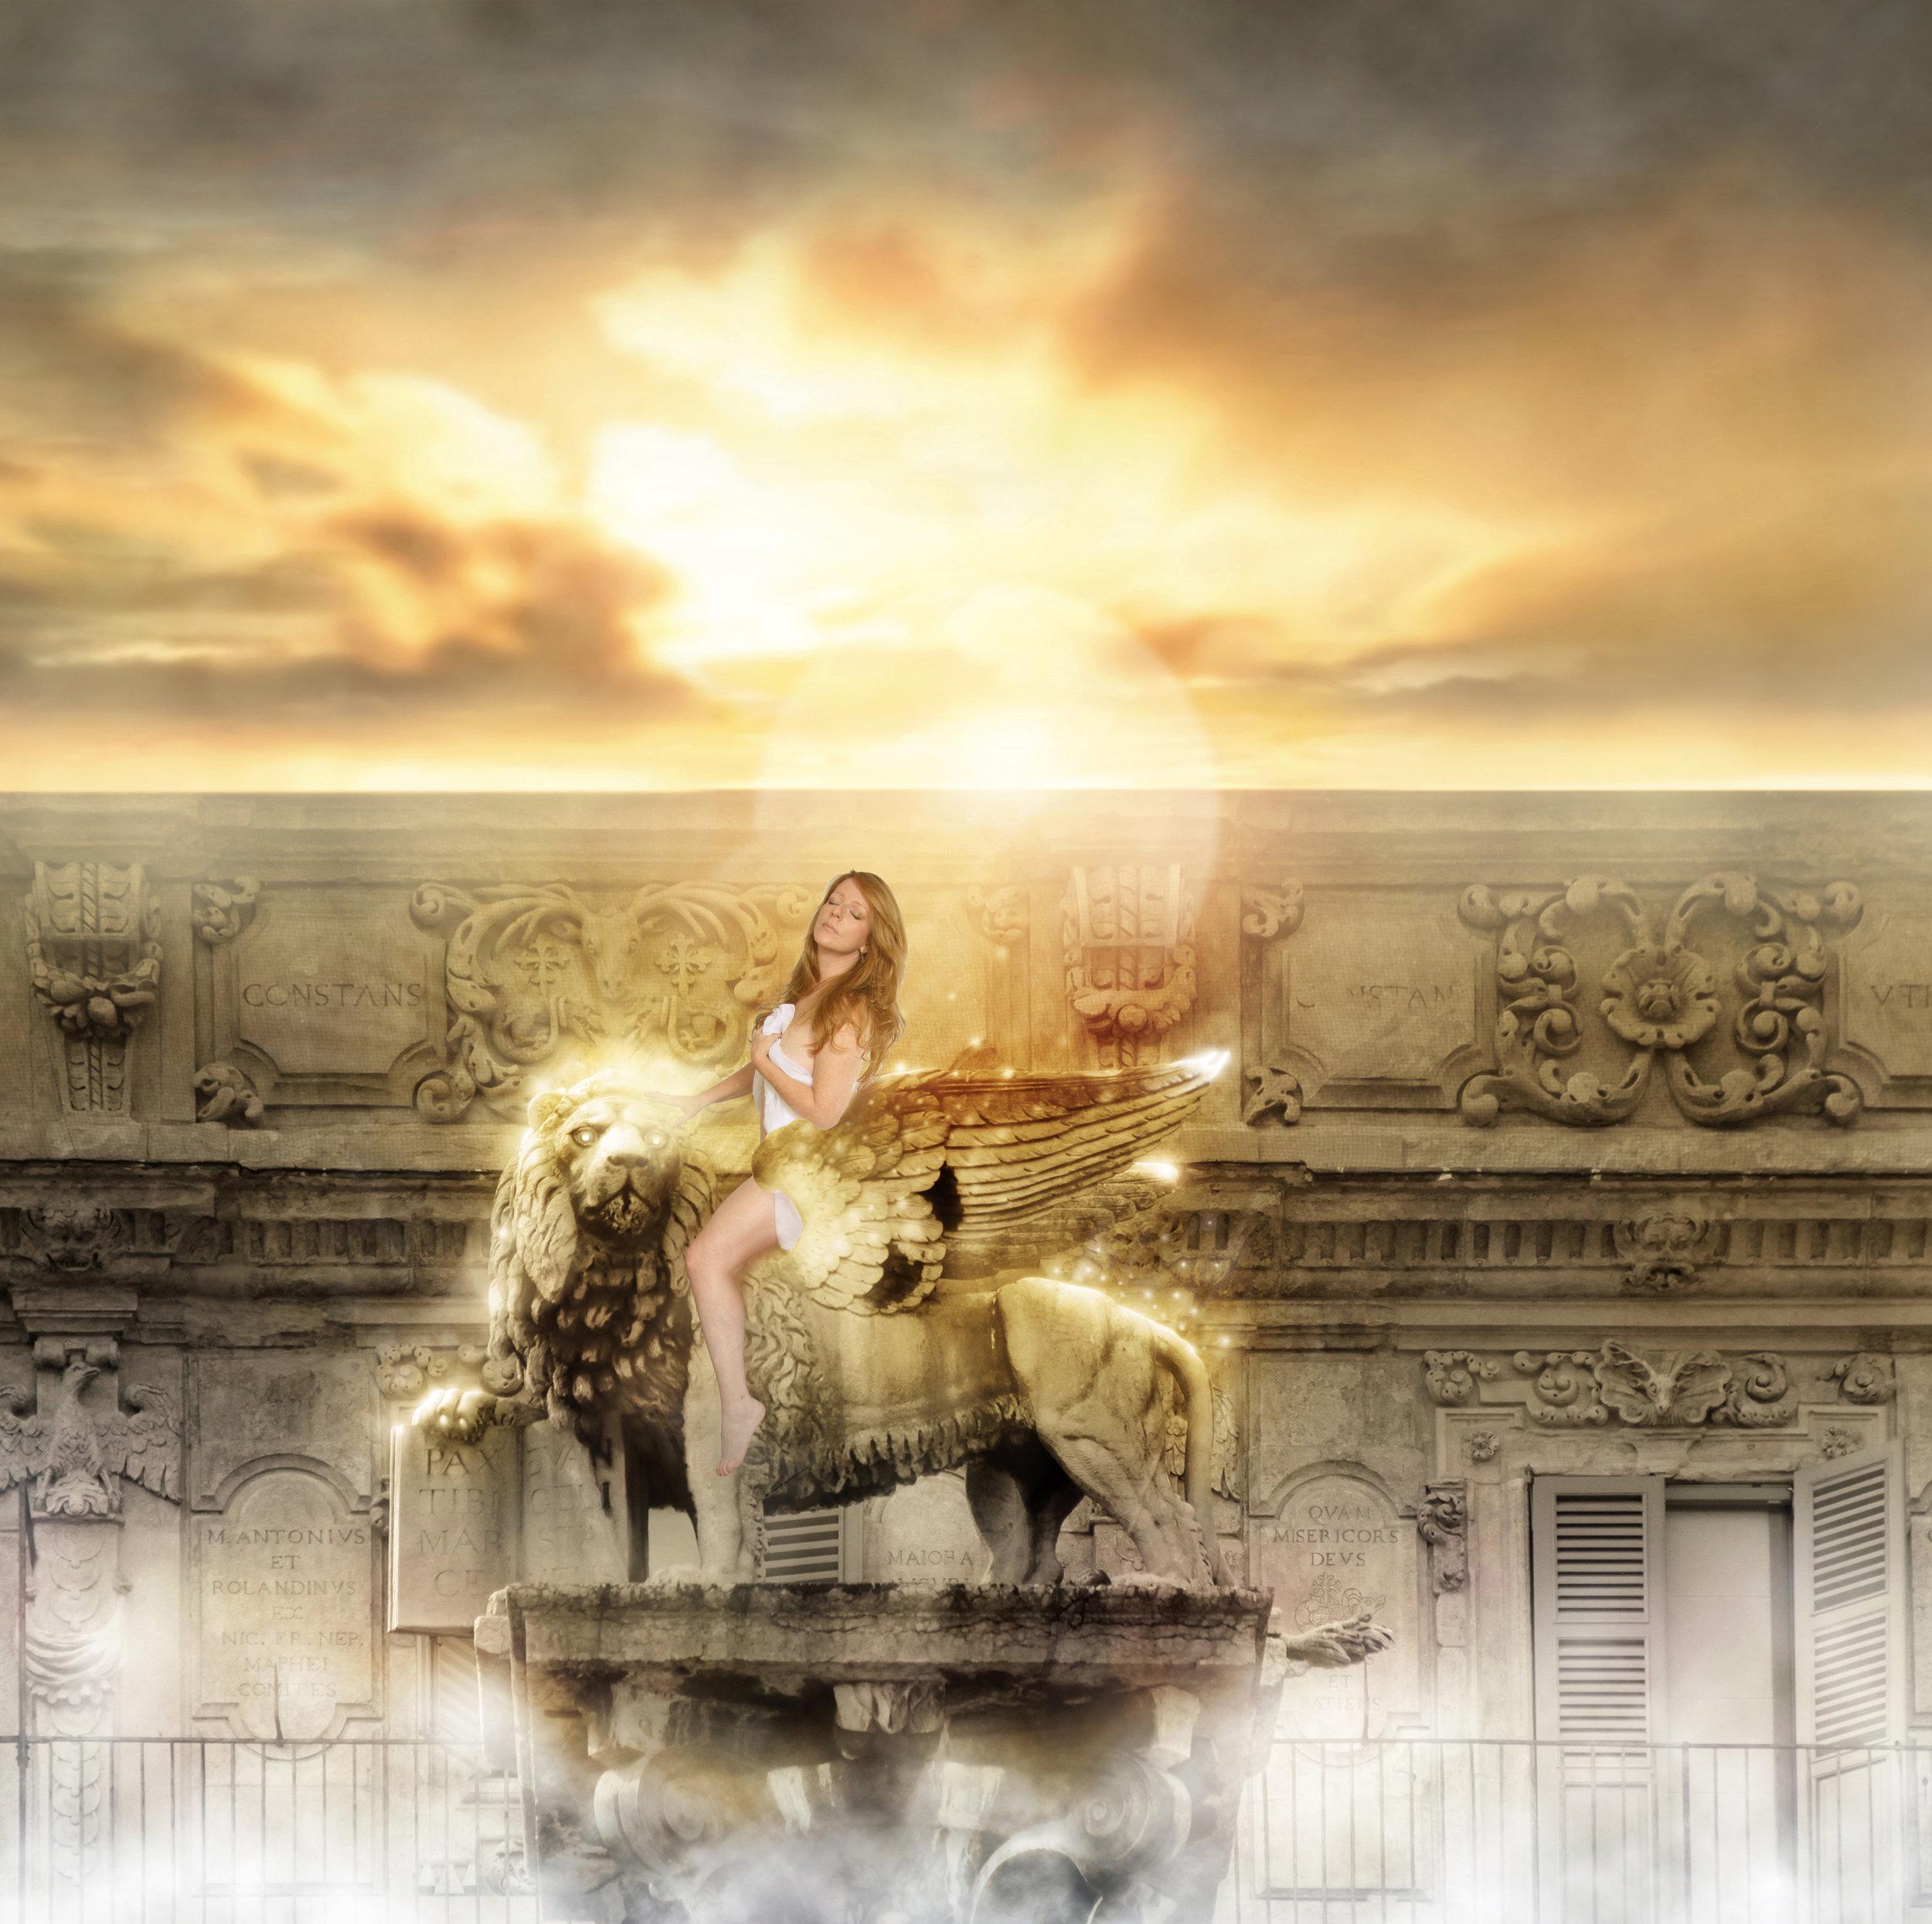 Kathy goddess w sky.jpg